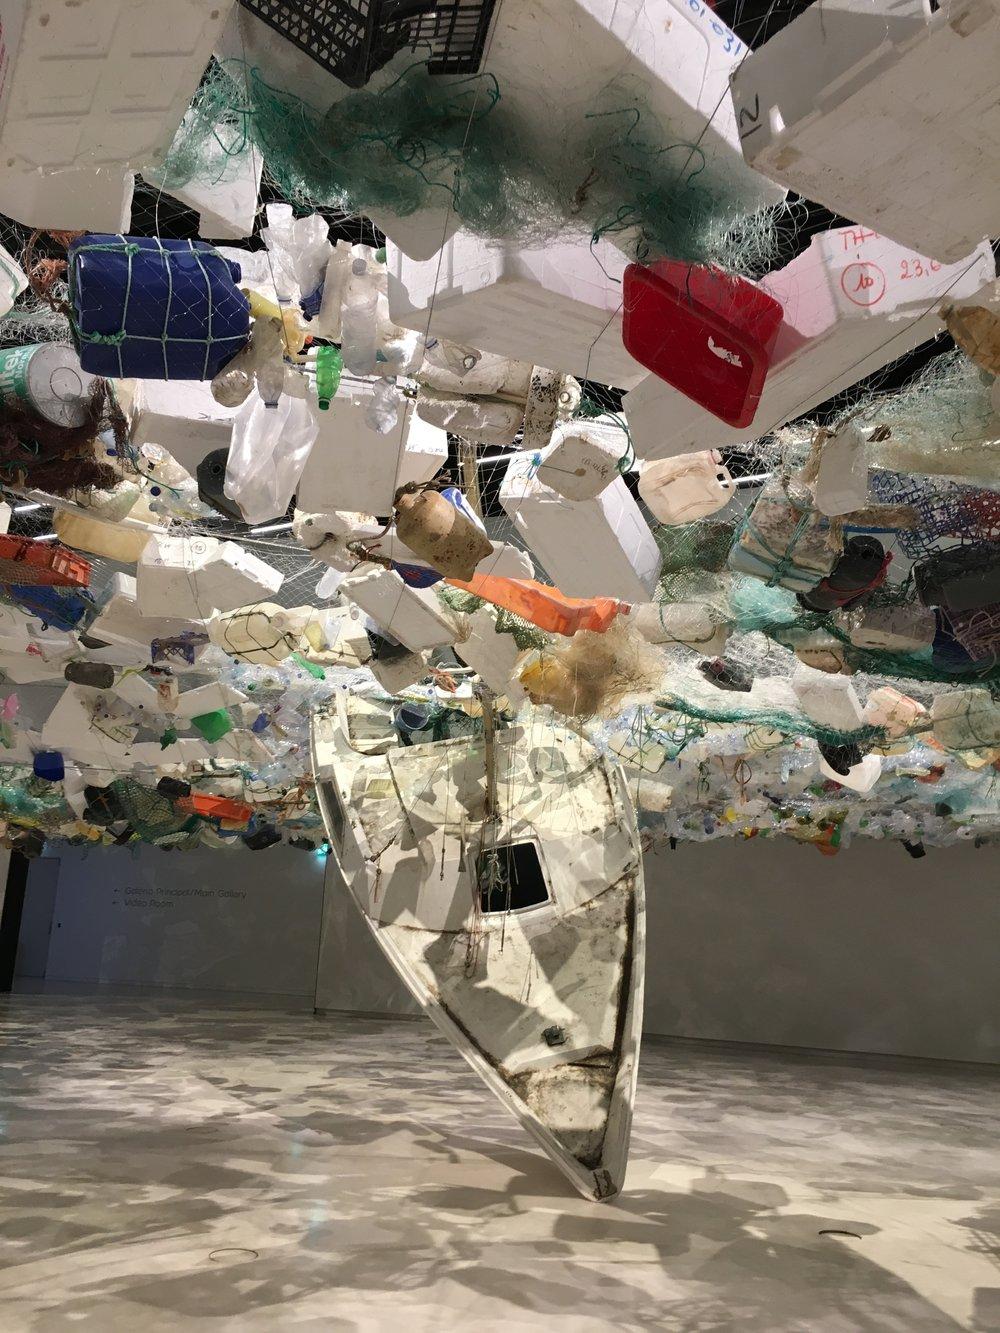 Tadashi Kawamata: Overflow